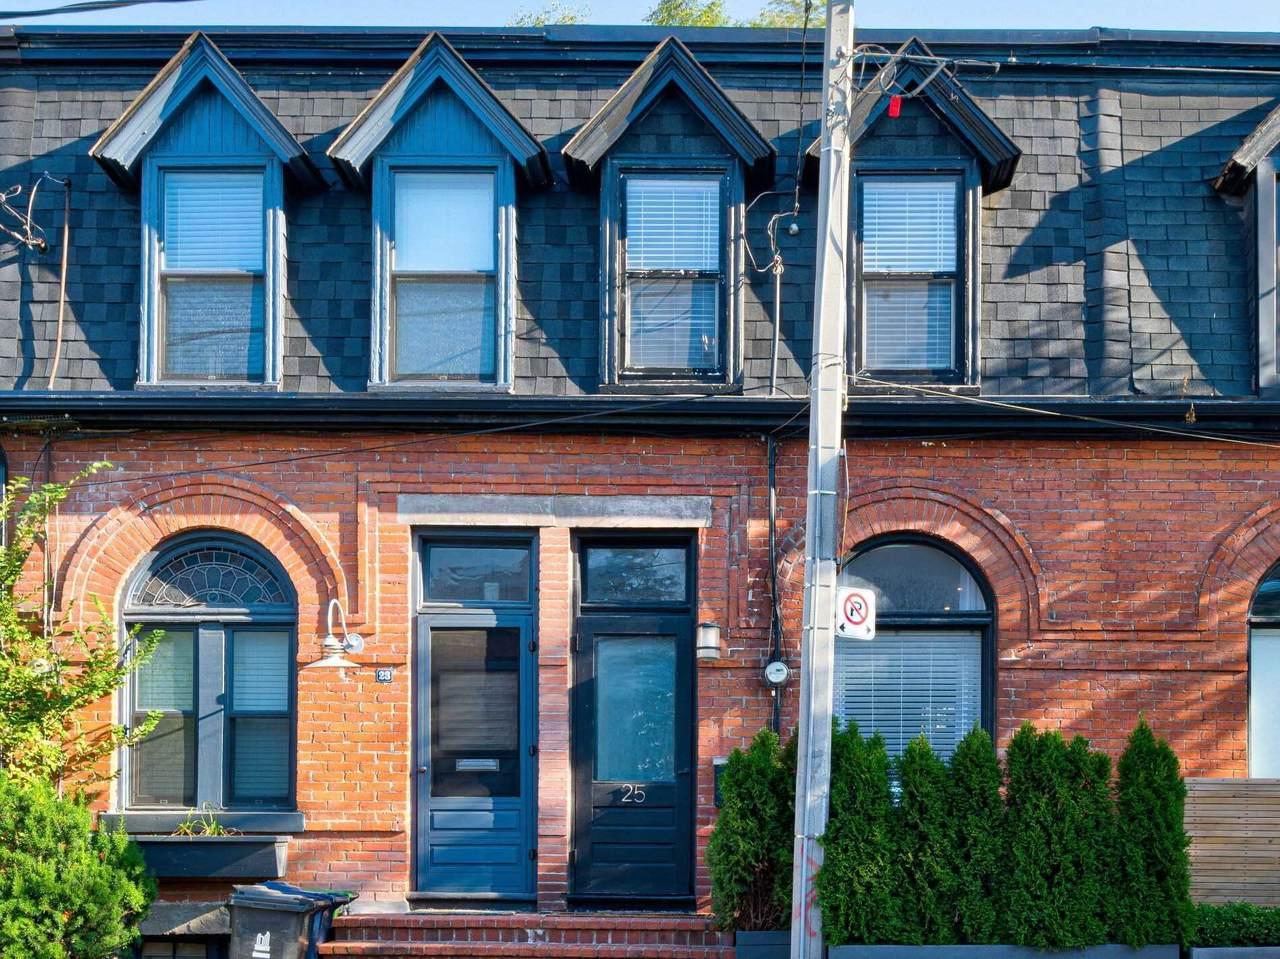 25 Belmont St - Photo 1